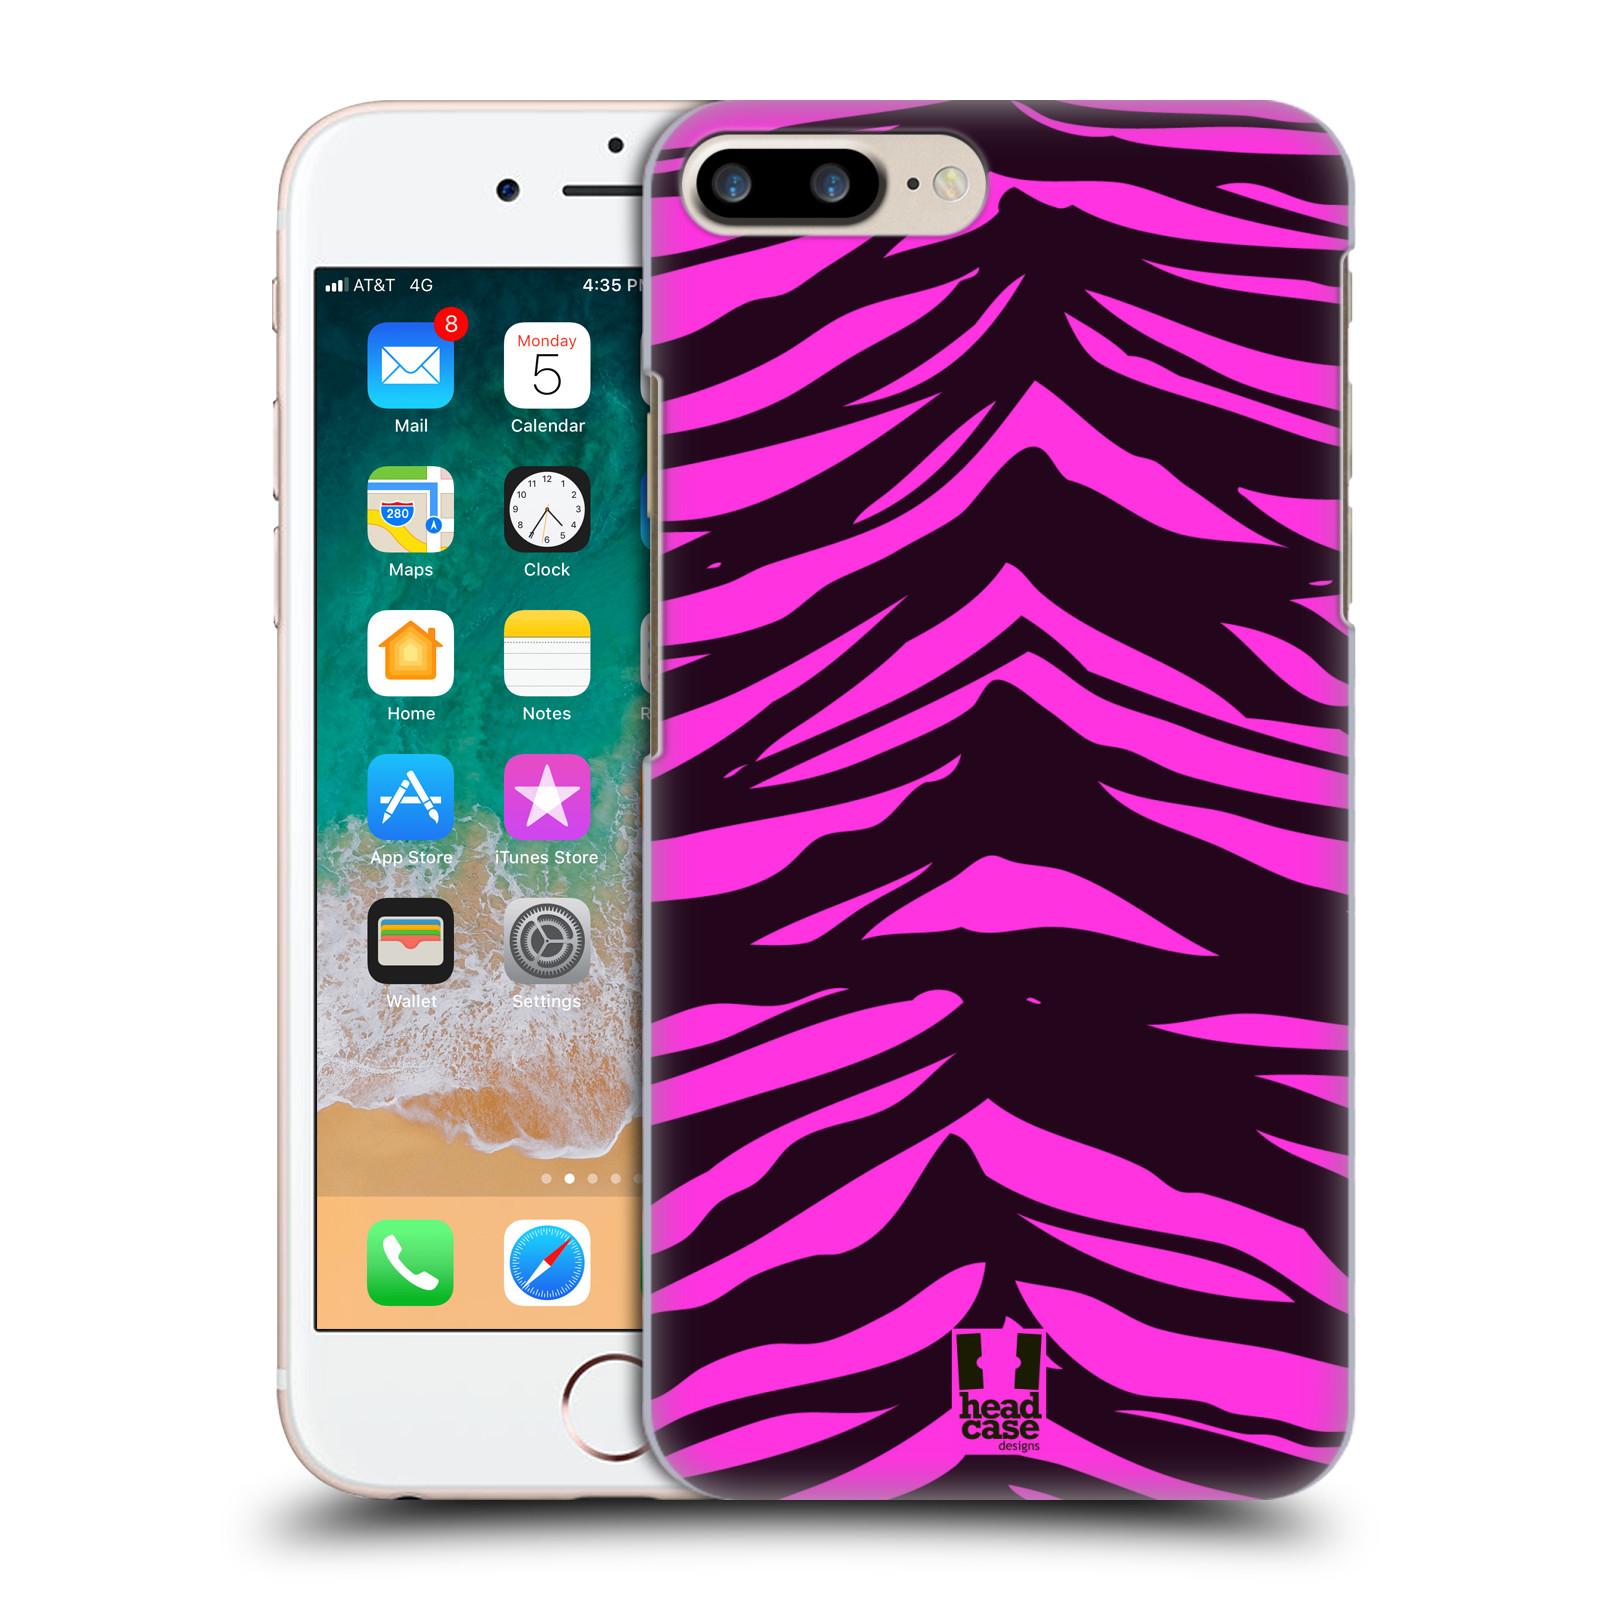 HEAD CASE plastový obal na mobil Apple Iphone 7 PLUS vzor Divočina zvíře tygr anilinová/fialová